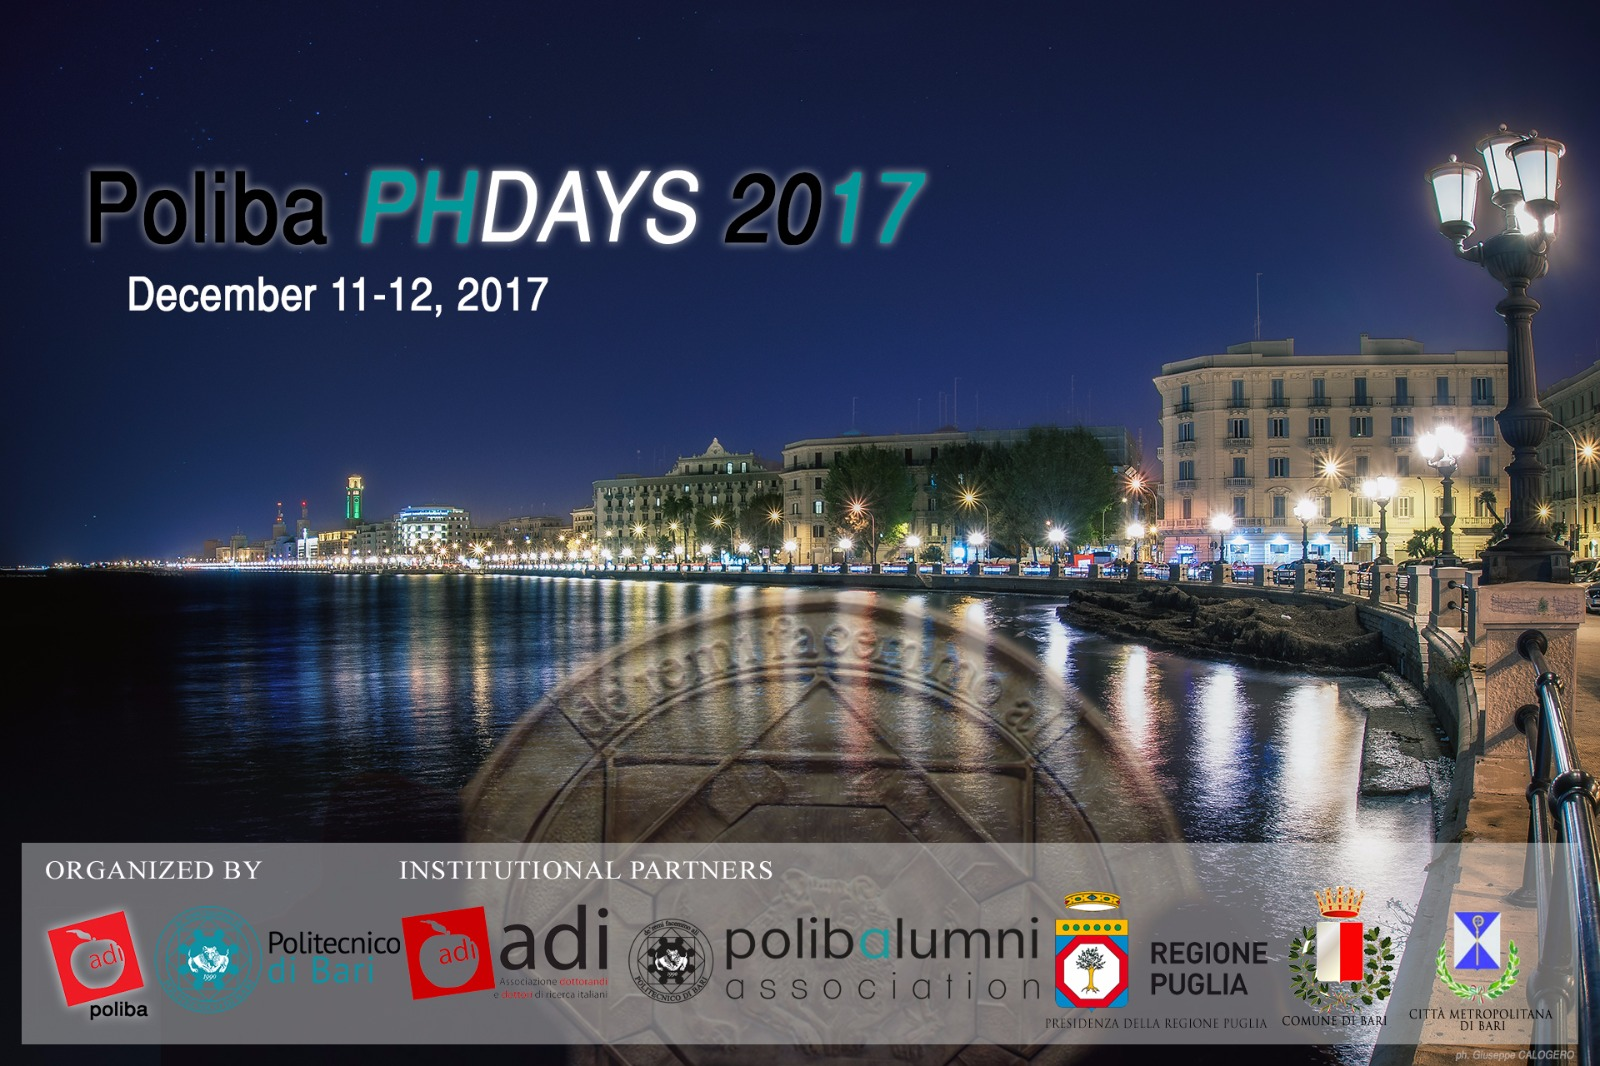 Poliba PhDays 2017